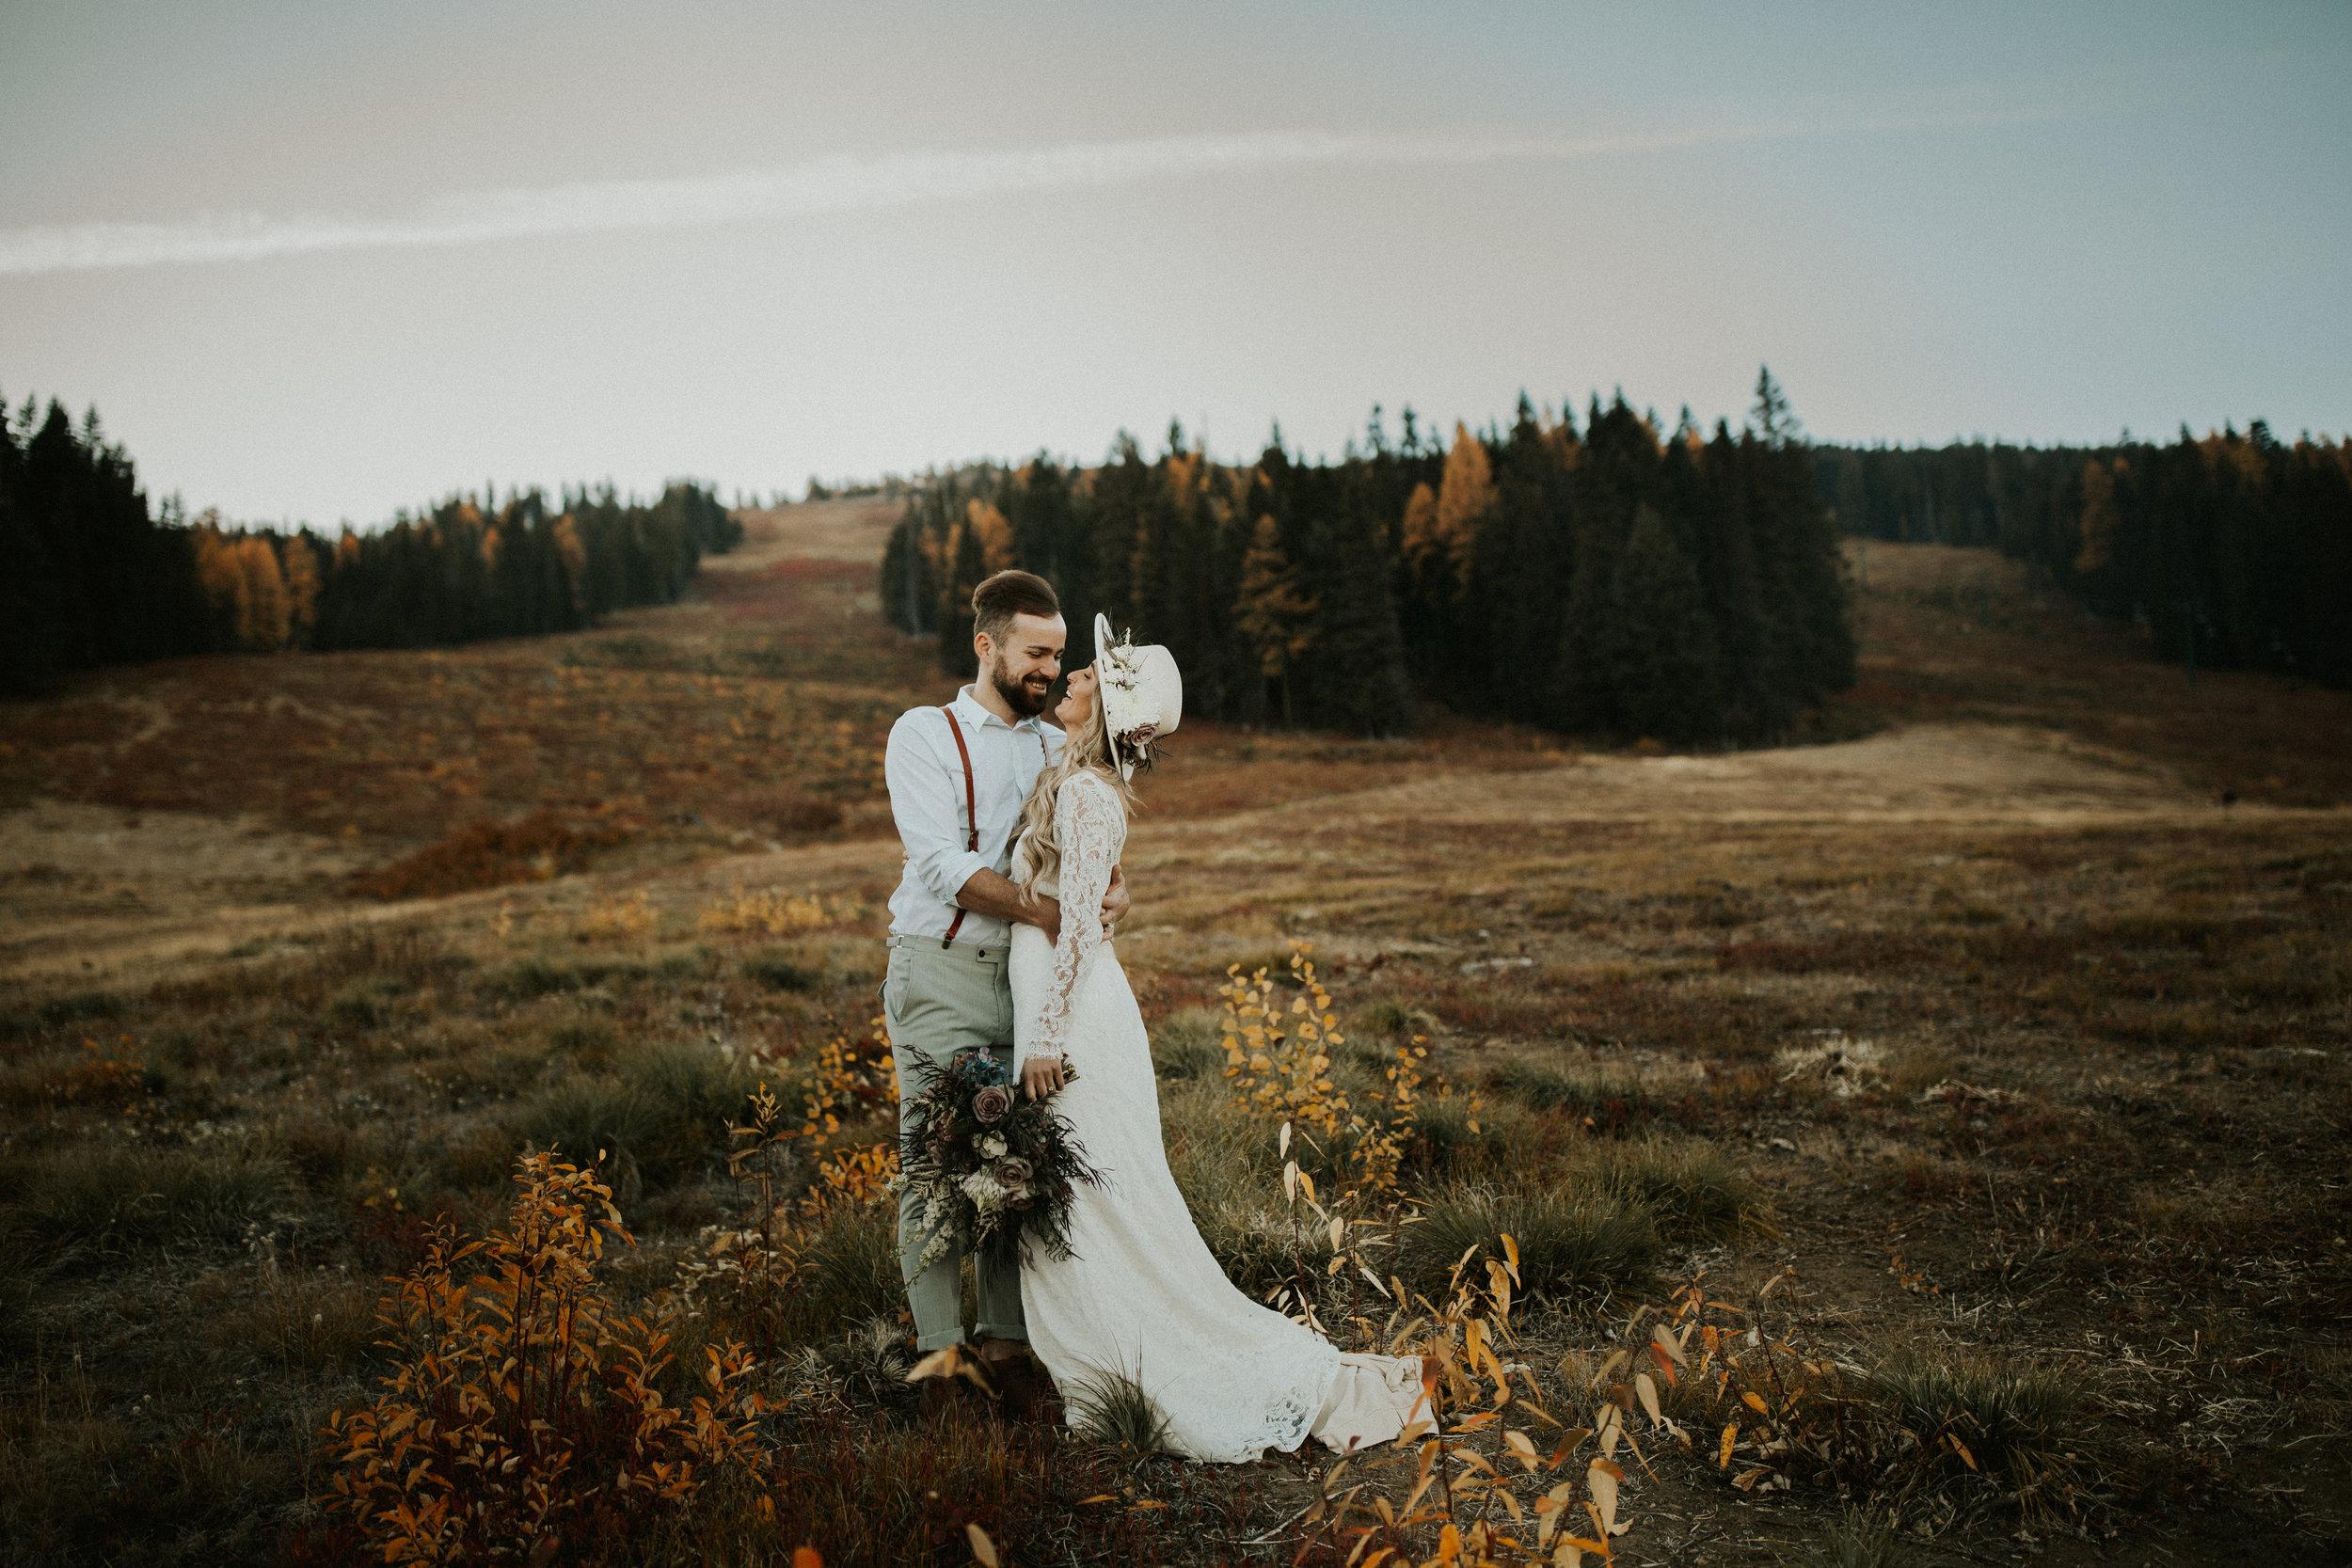 bridal spokane photo shoot bride and groom